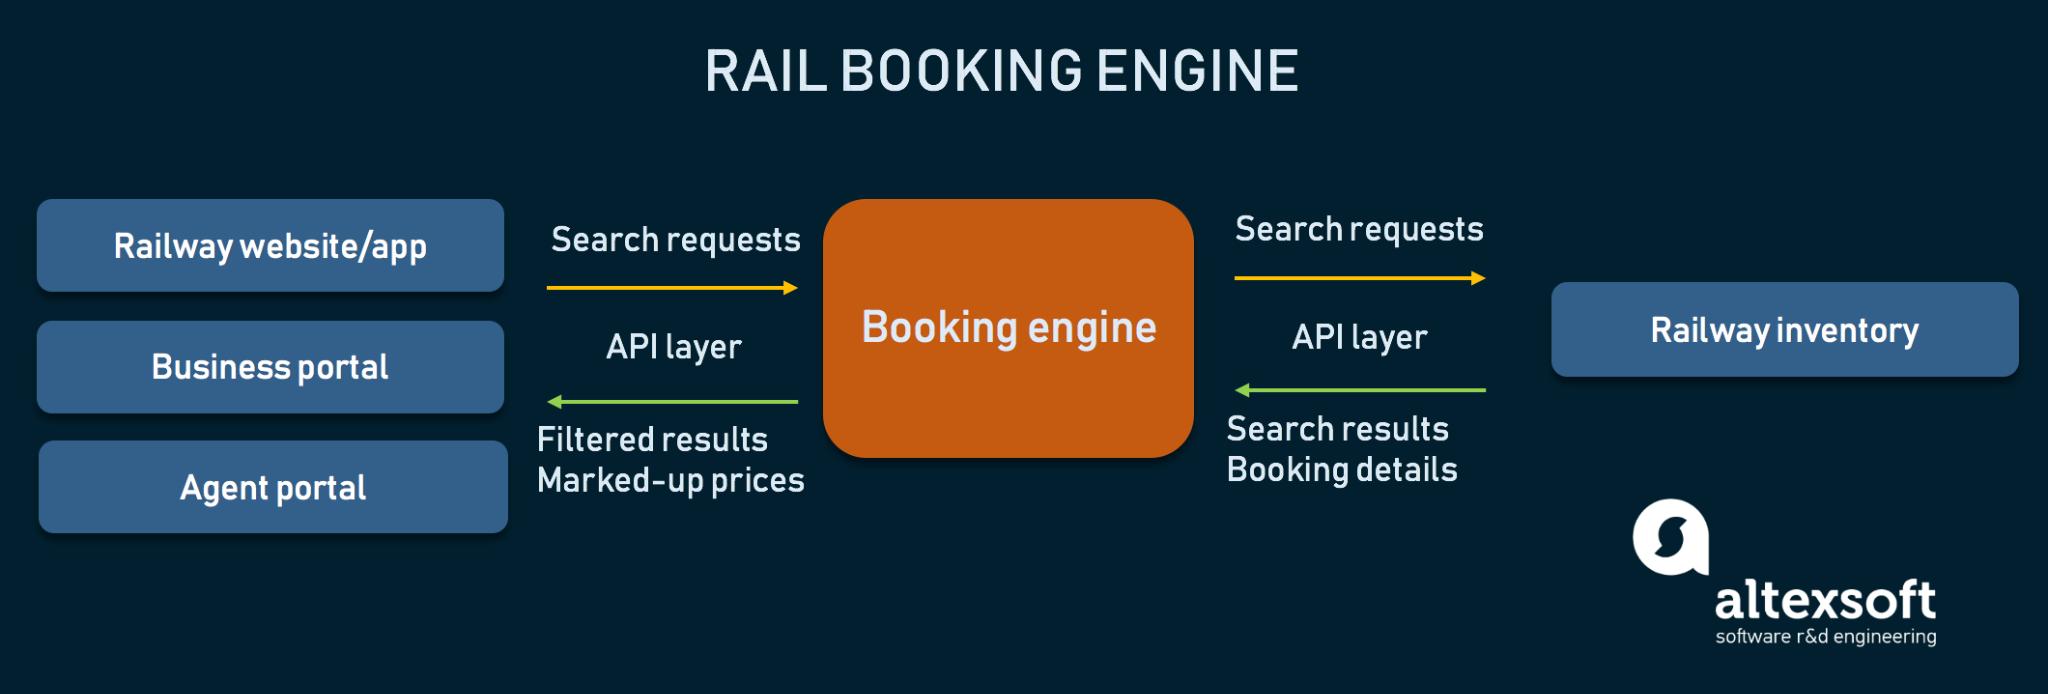 rail booking engine